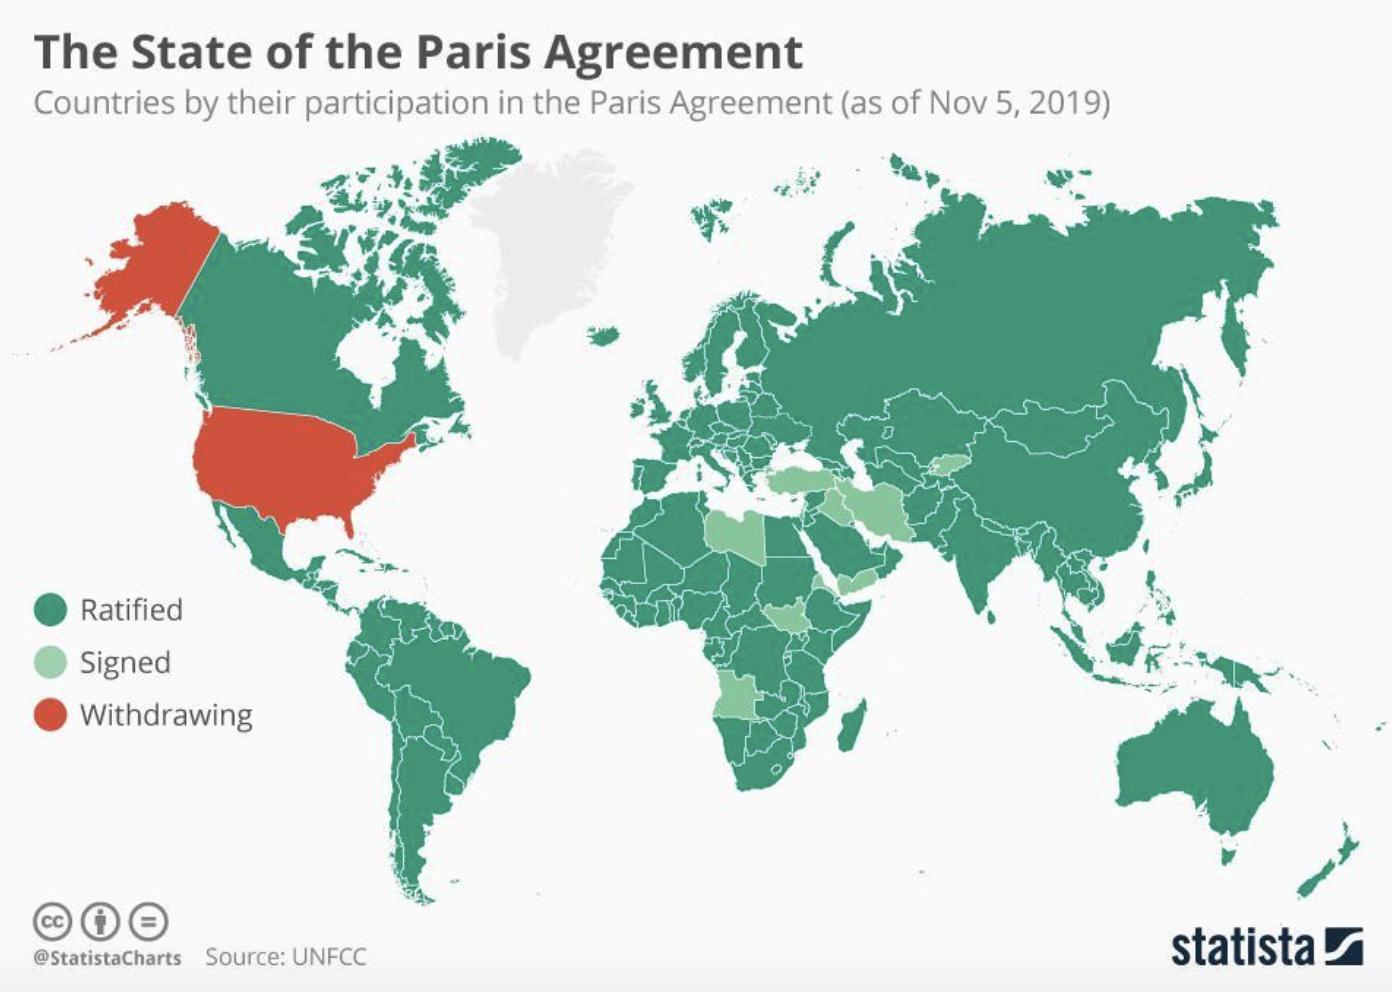 Countries by Paris Agreement participation (Nov. 5, 2019)STATISTA/UNFCC